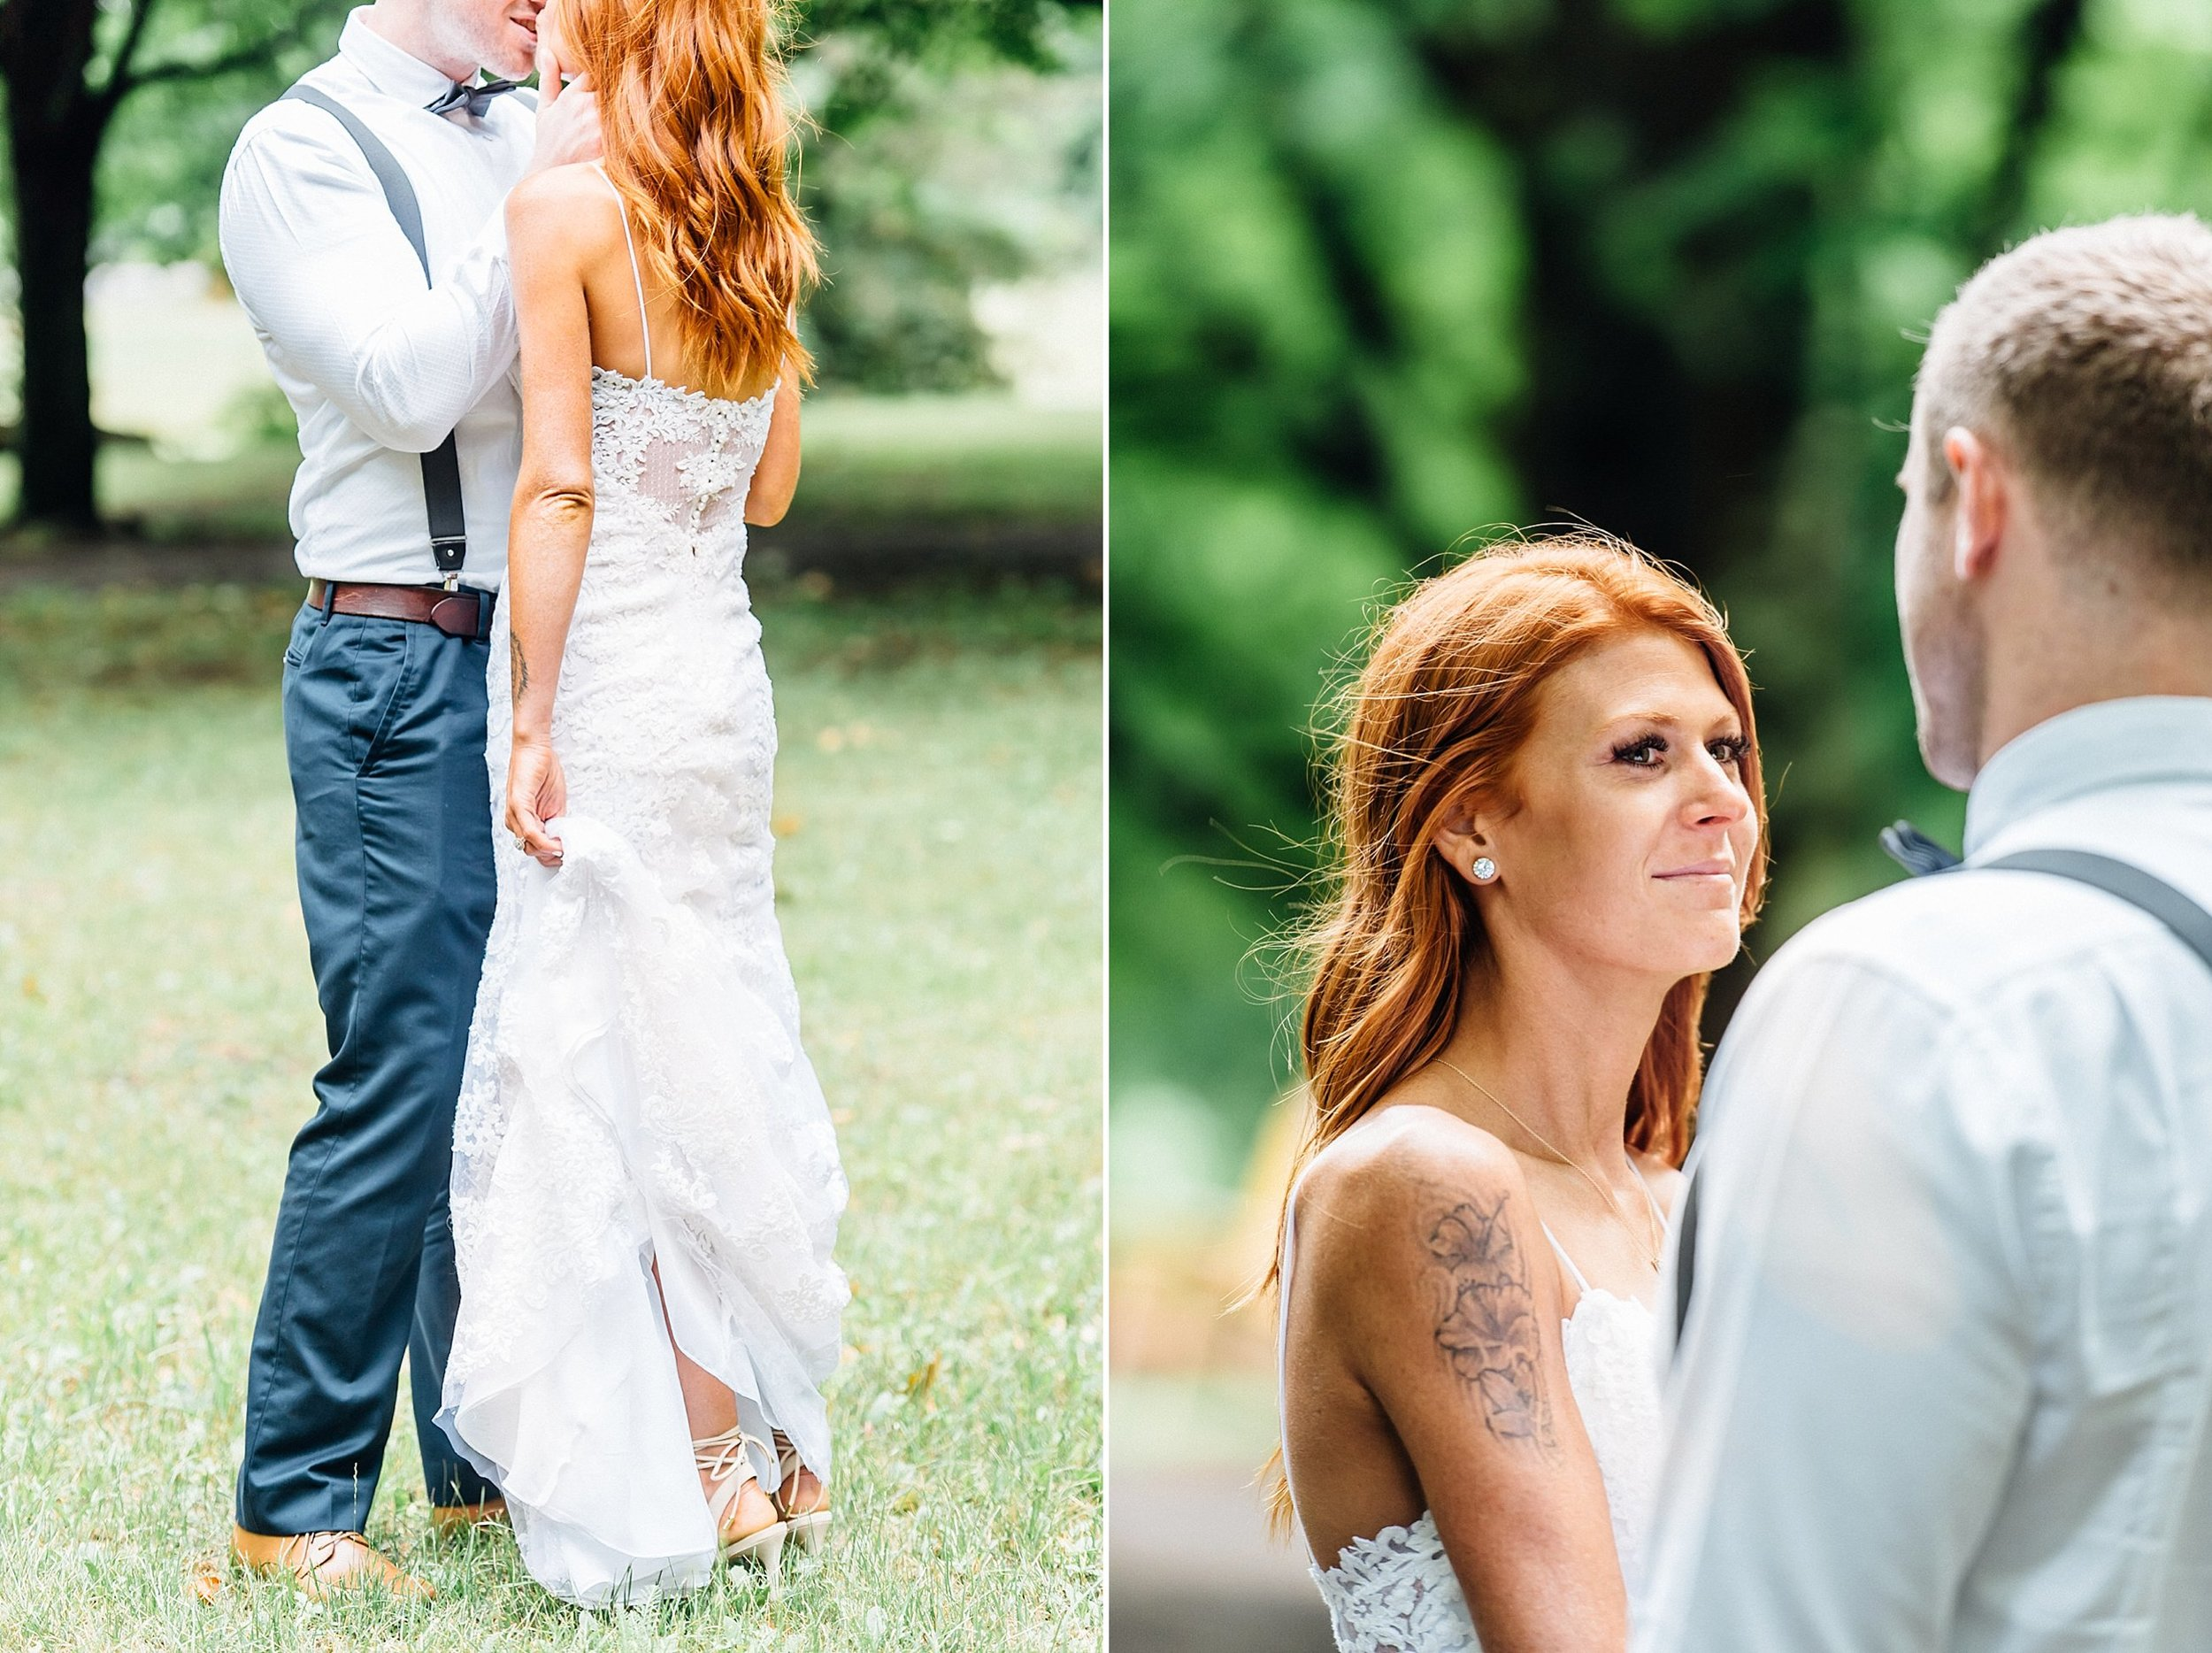 Ottawa Wedding Photographer - Stanley's Olde Maple Lane Barn Wedding - Ali & Batoul Photography_0016.jpg